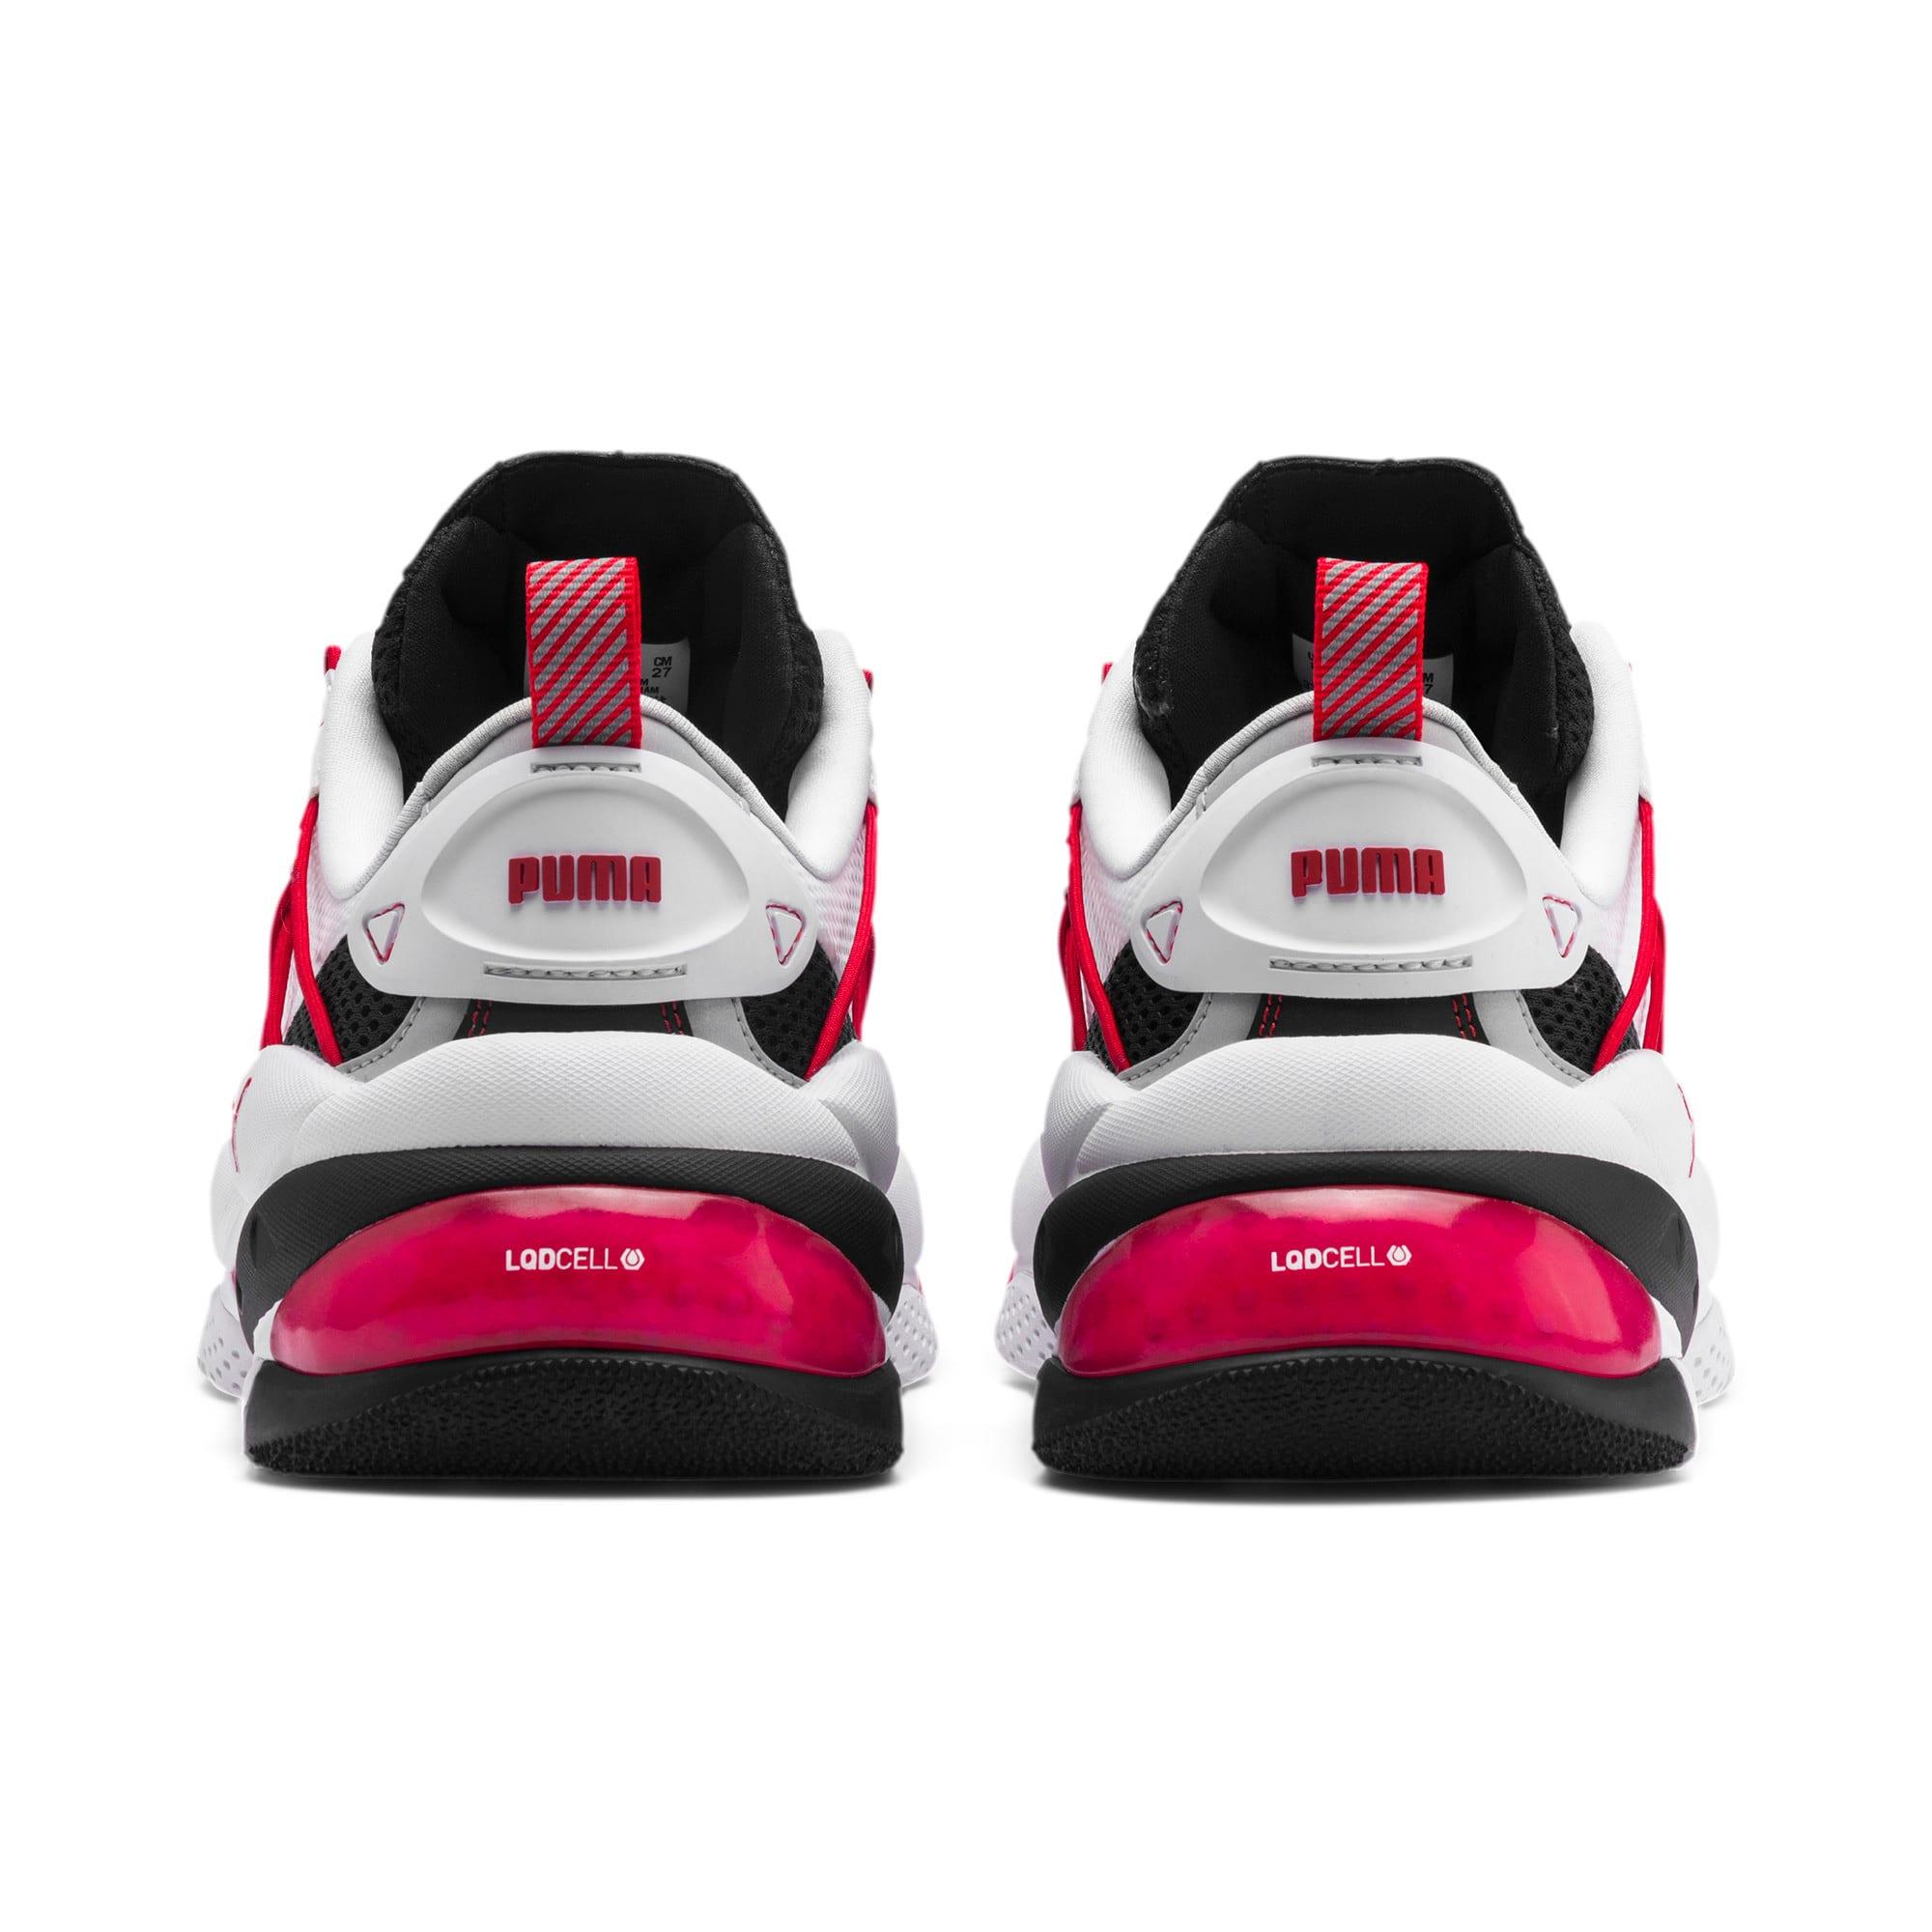 Thumbnail 3 of LQDCELL Omega Training Shoes, Puma Black-Puma White, medium